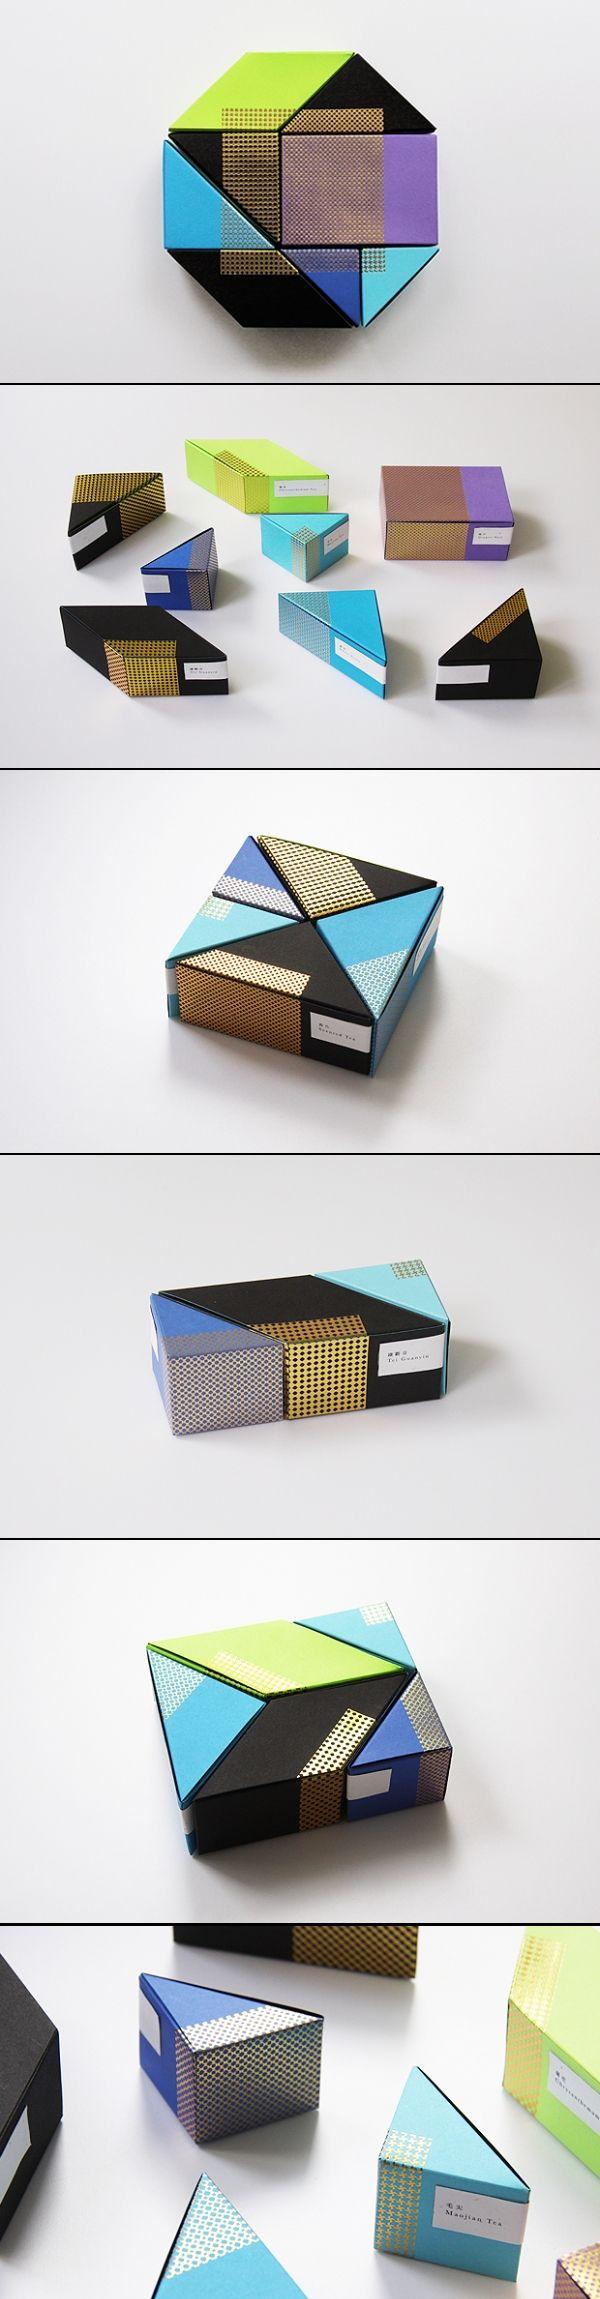 astrobrights paper tea packaging design series